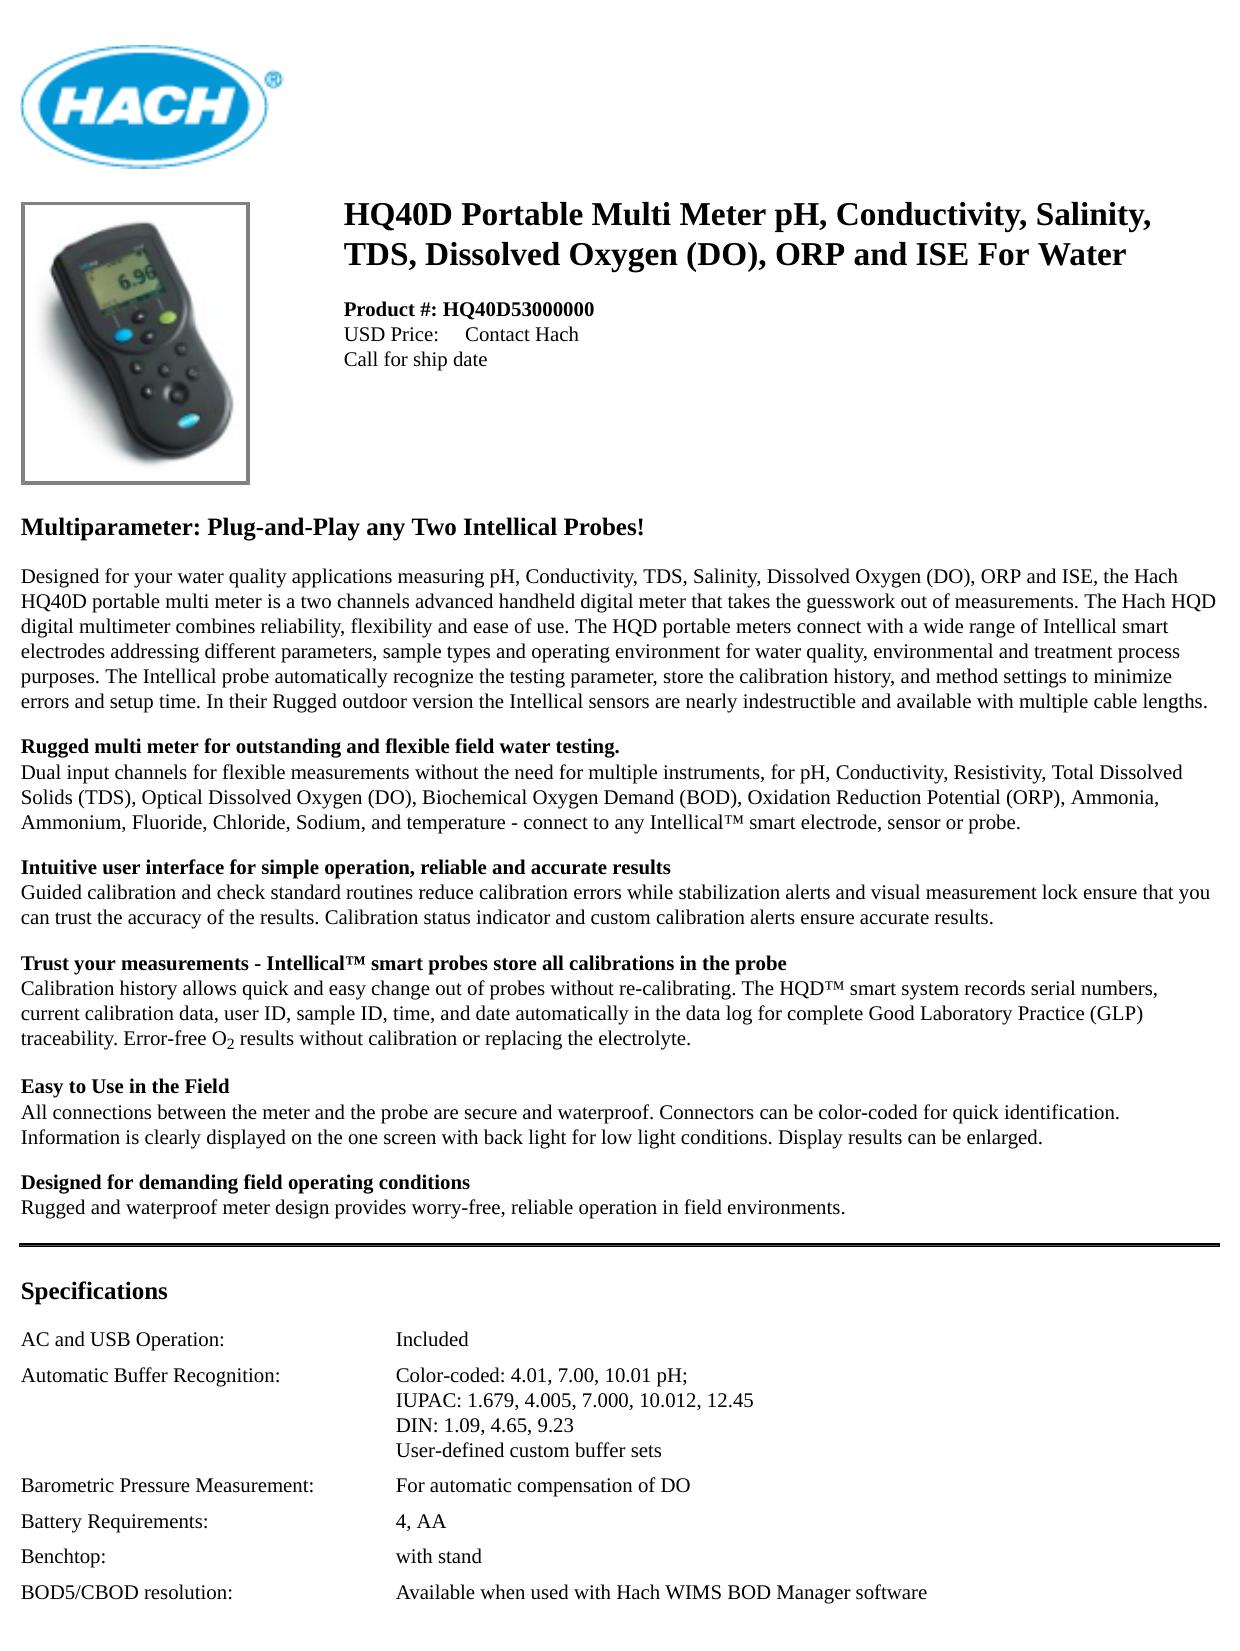 Hq40d Portable Multi Meter Ph Conductivity Salinity Tds Manualzz